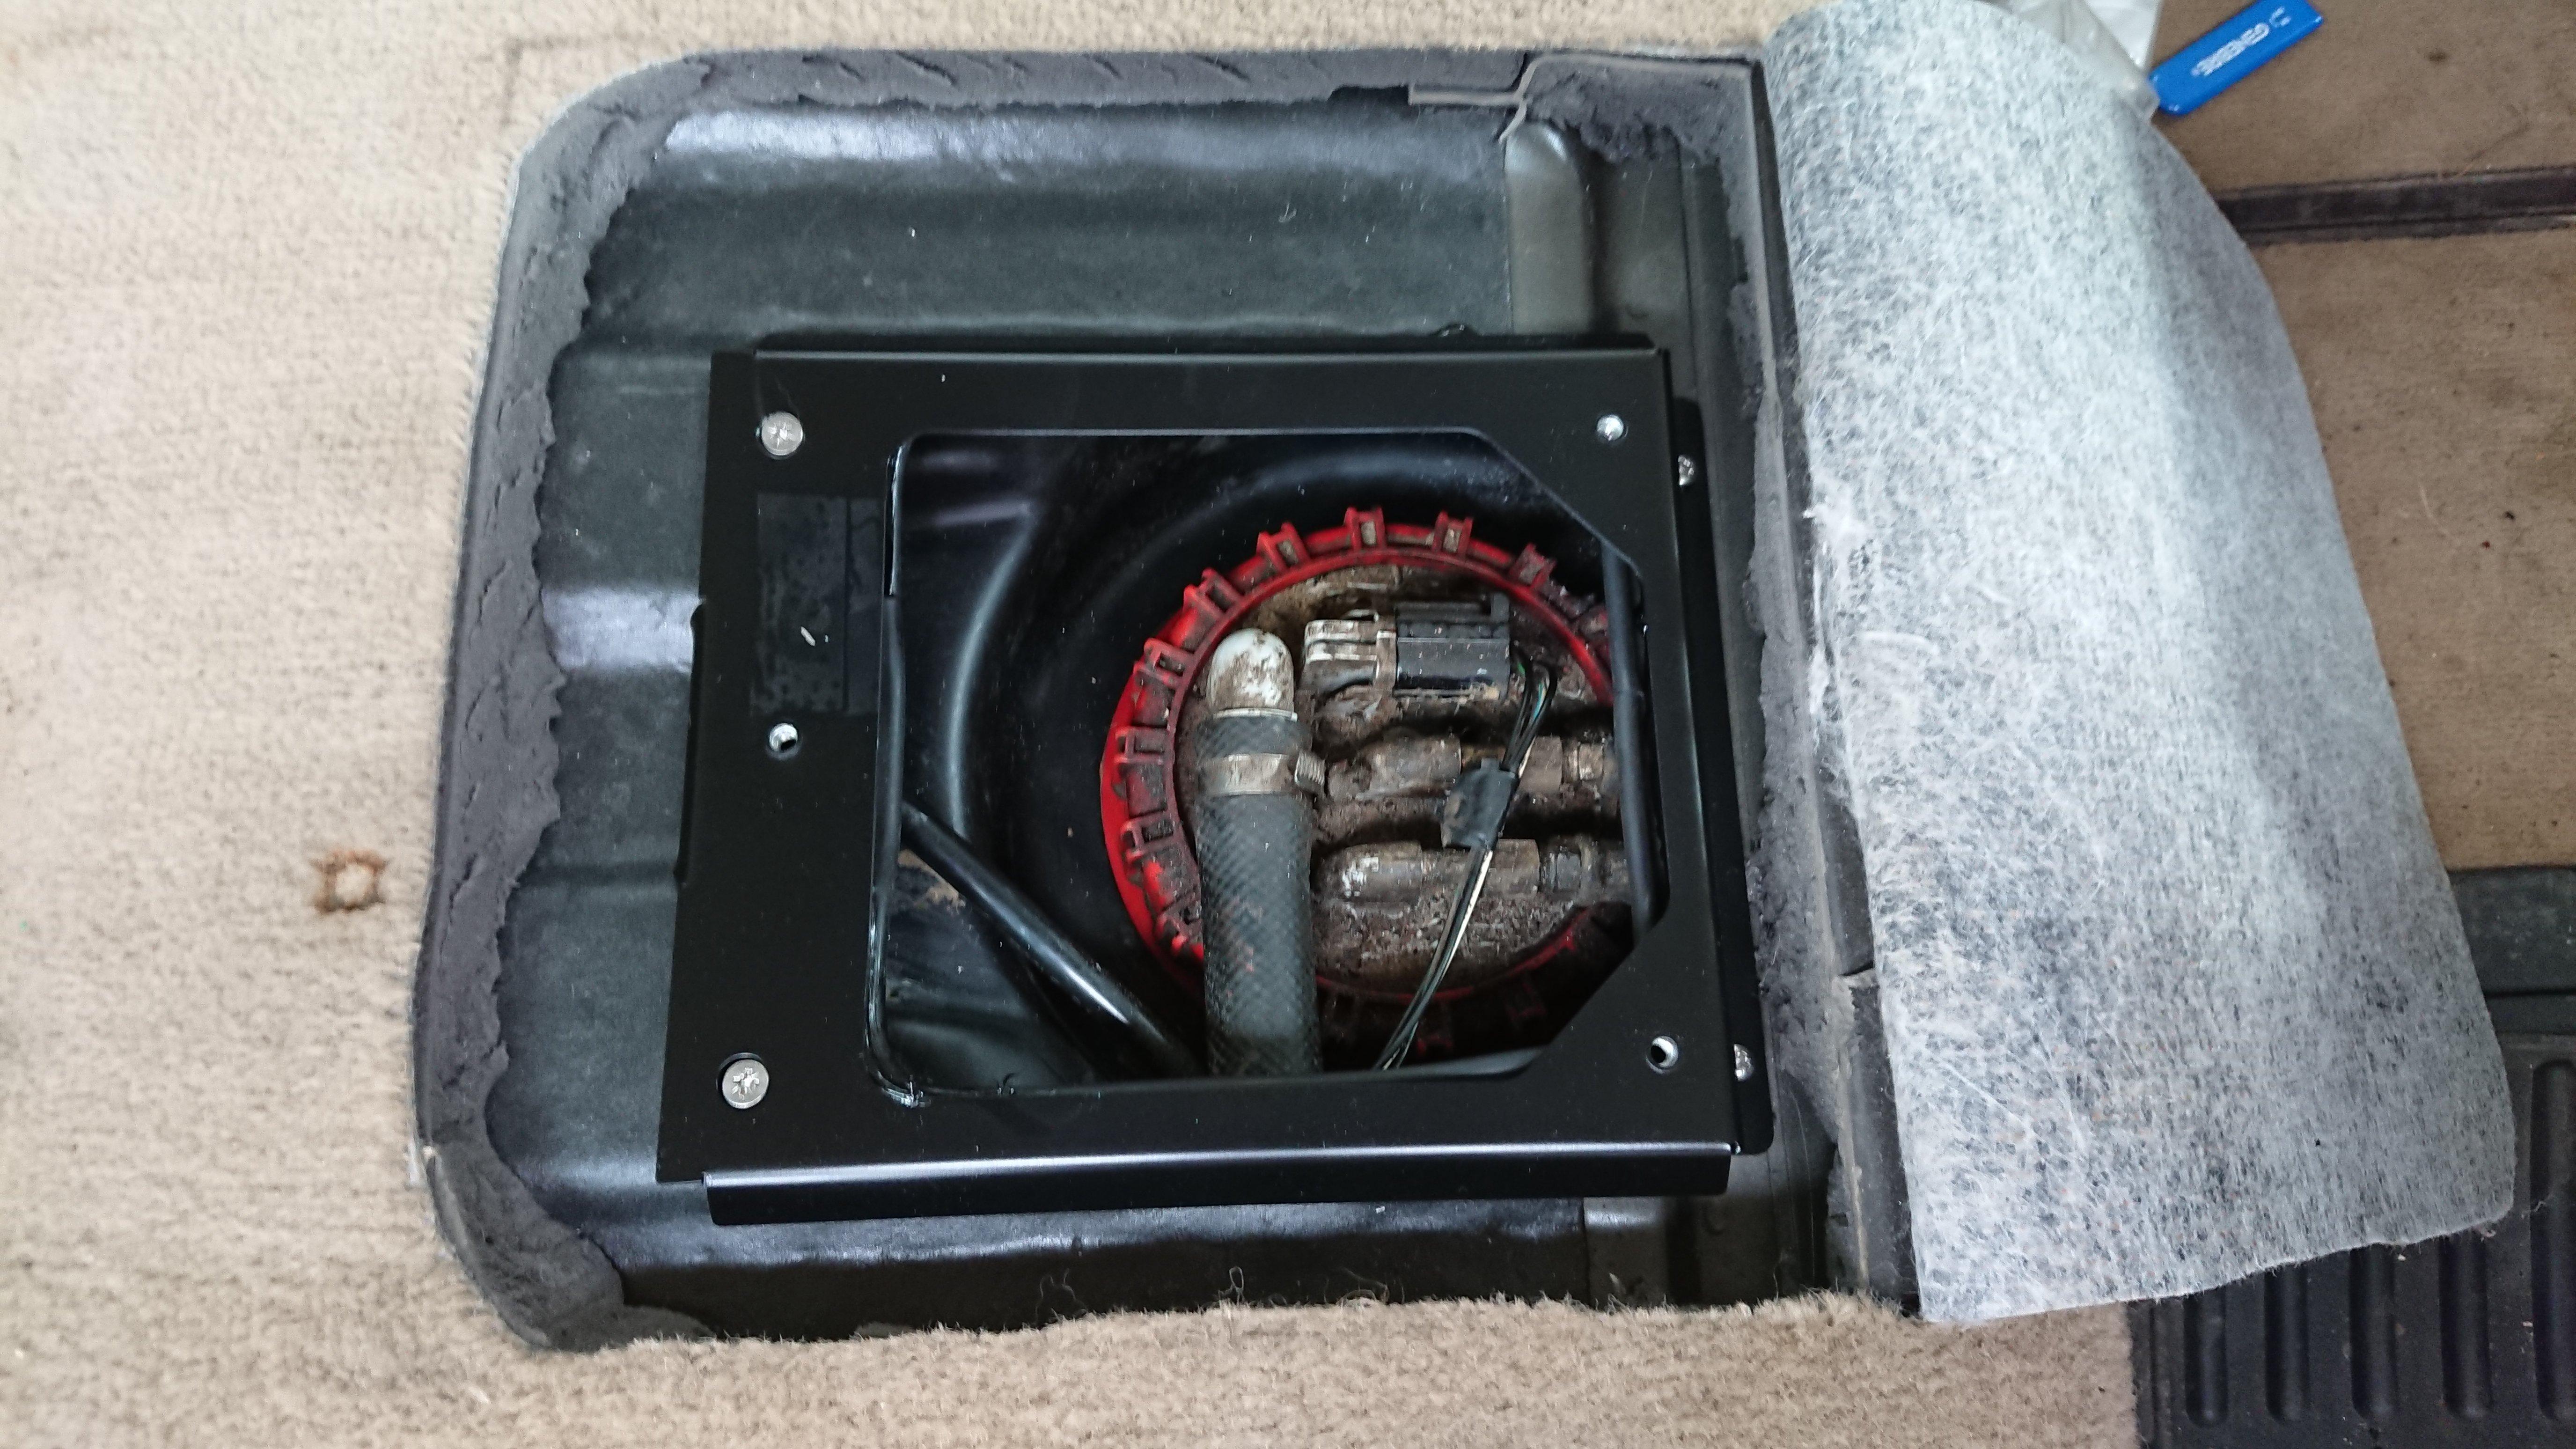 2001 P38 Fuel Pump / Location / Specs-dsc_0042.jpg